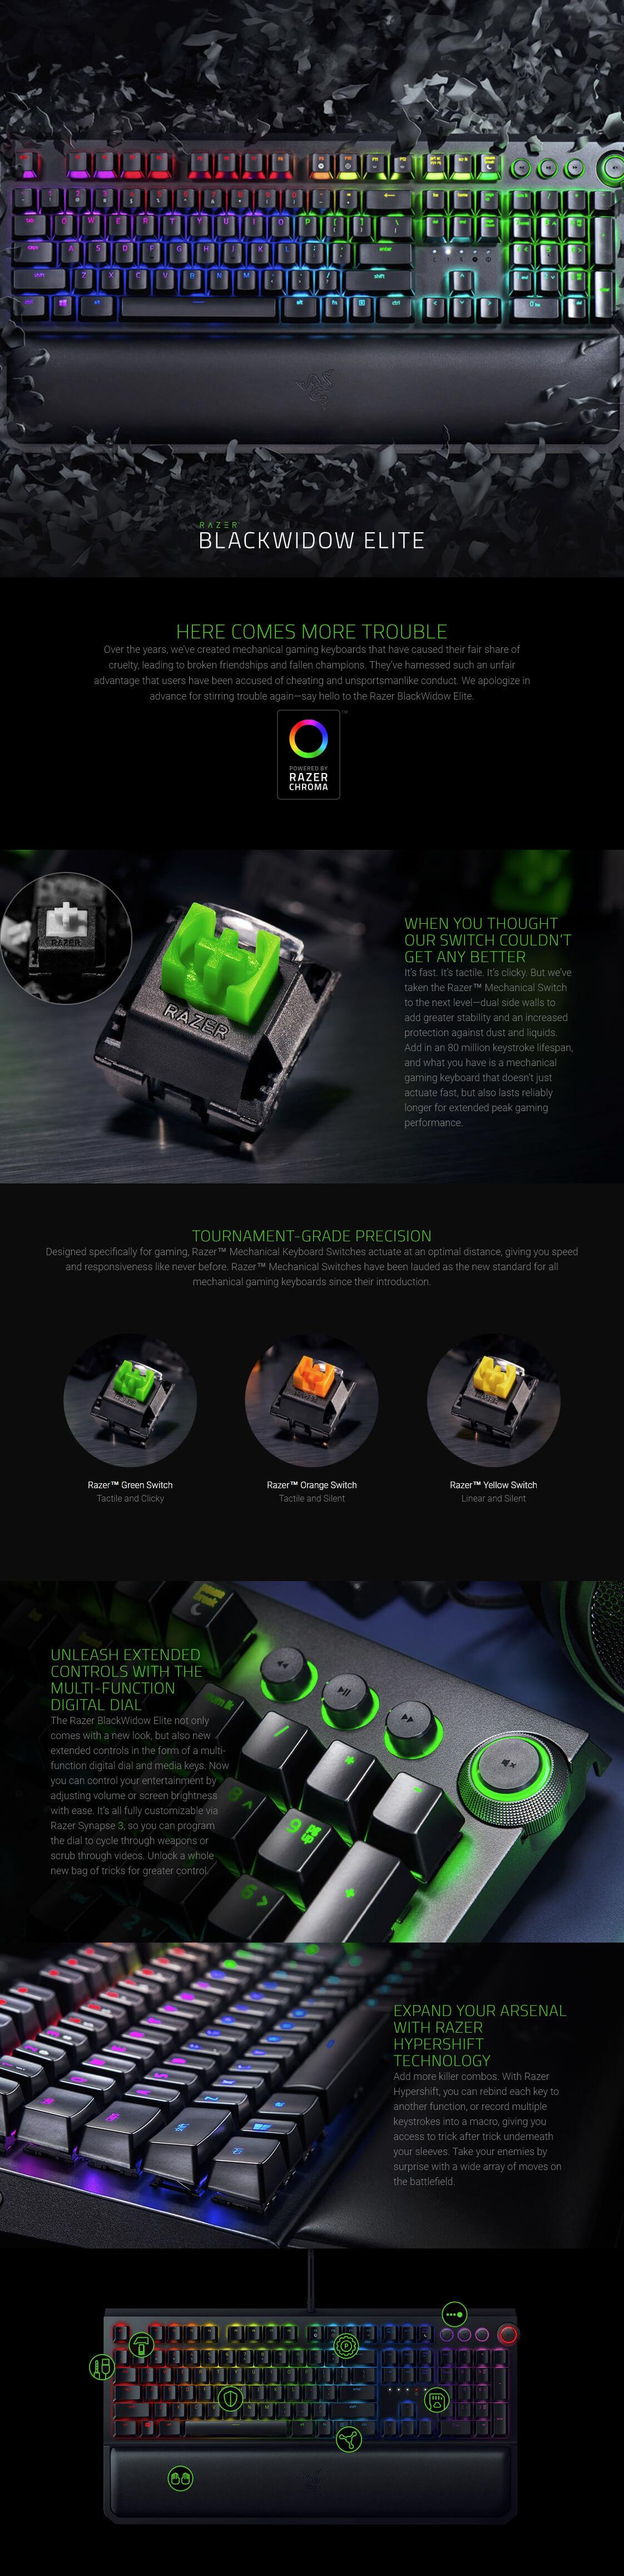 Razer BlackWidow Elite Chroma Mechanical Gaming Keyboard, Green Switch